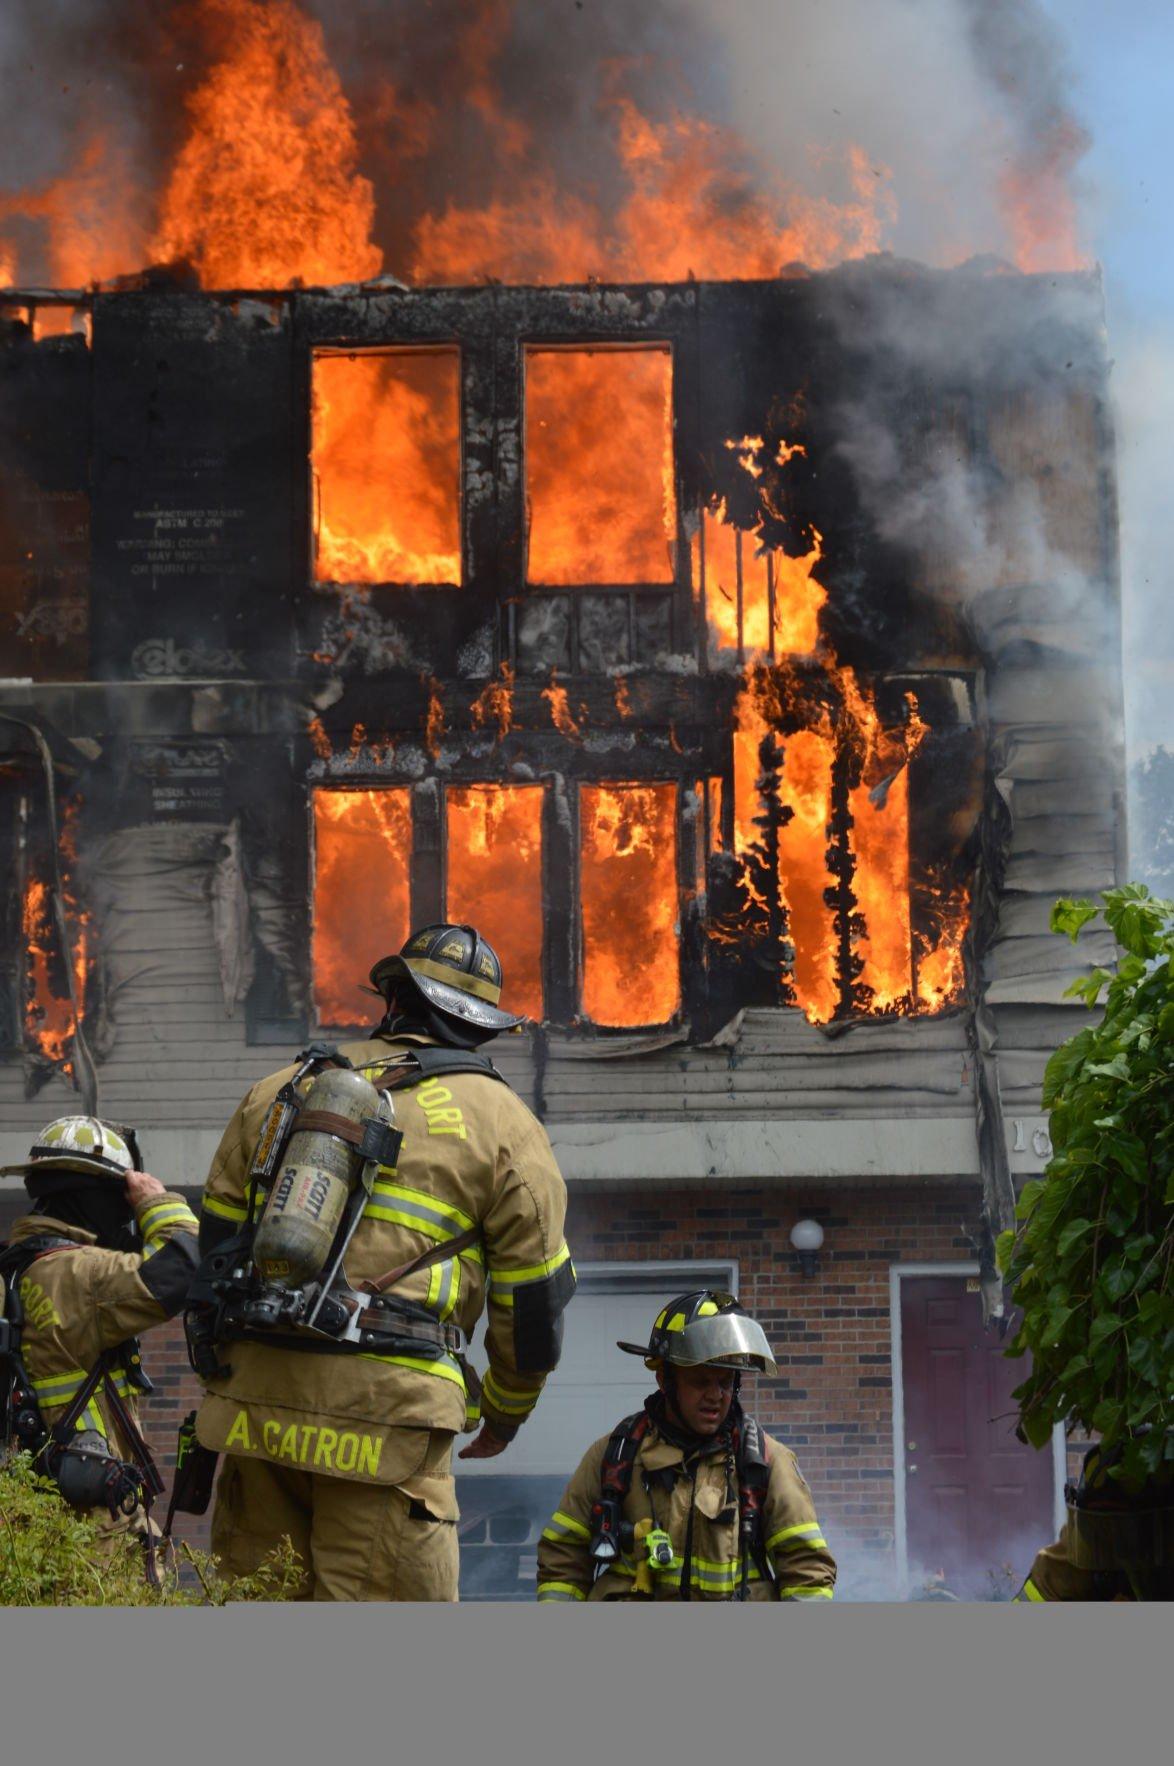 Update: 12 displaced by Kingsport blaze, pets killed